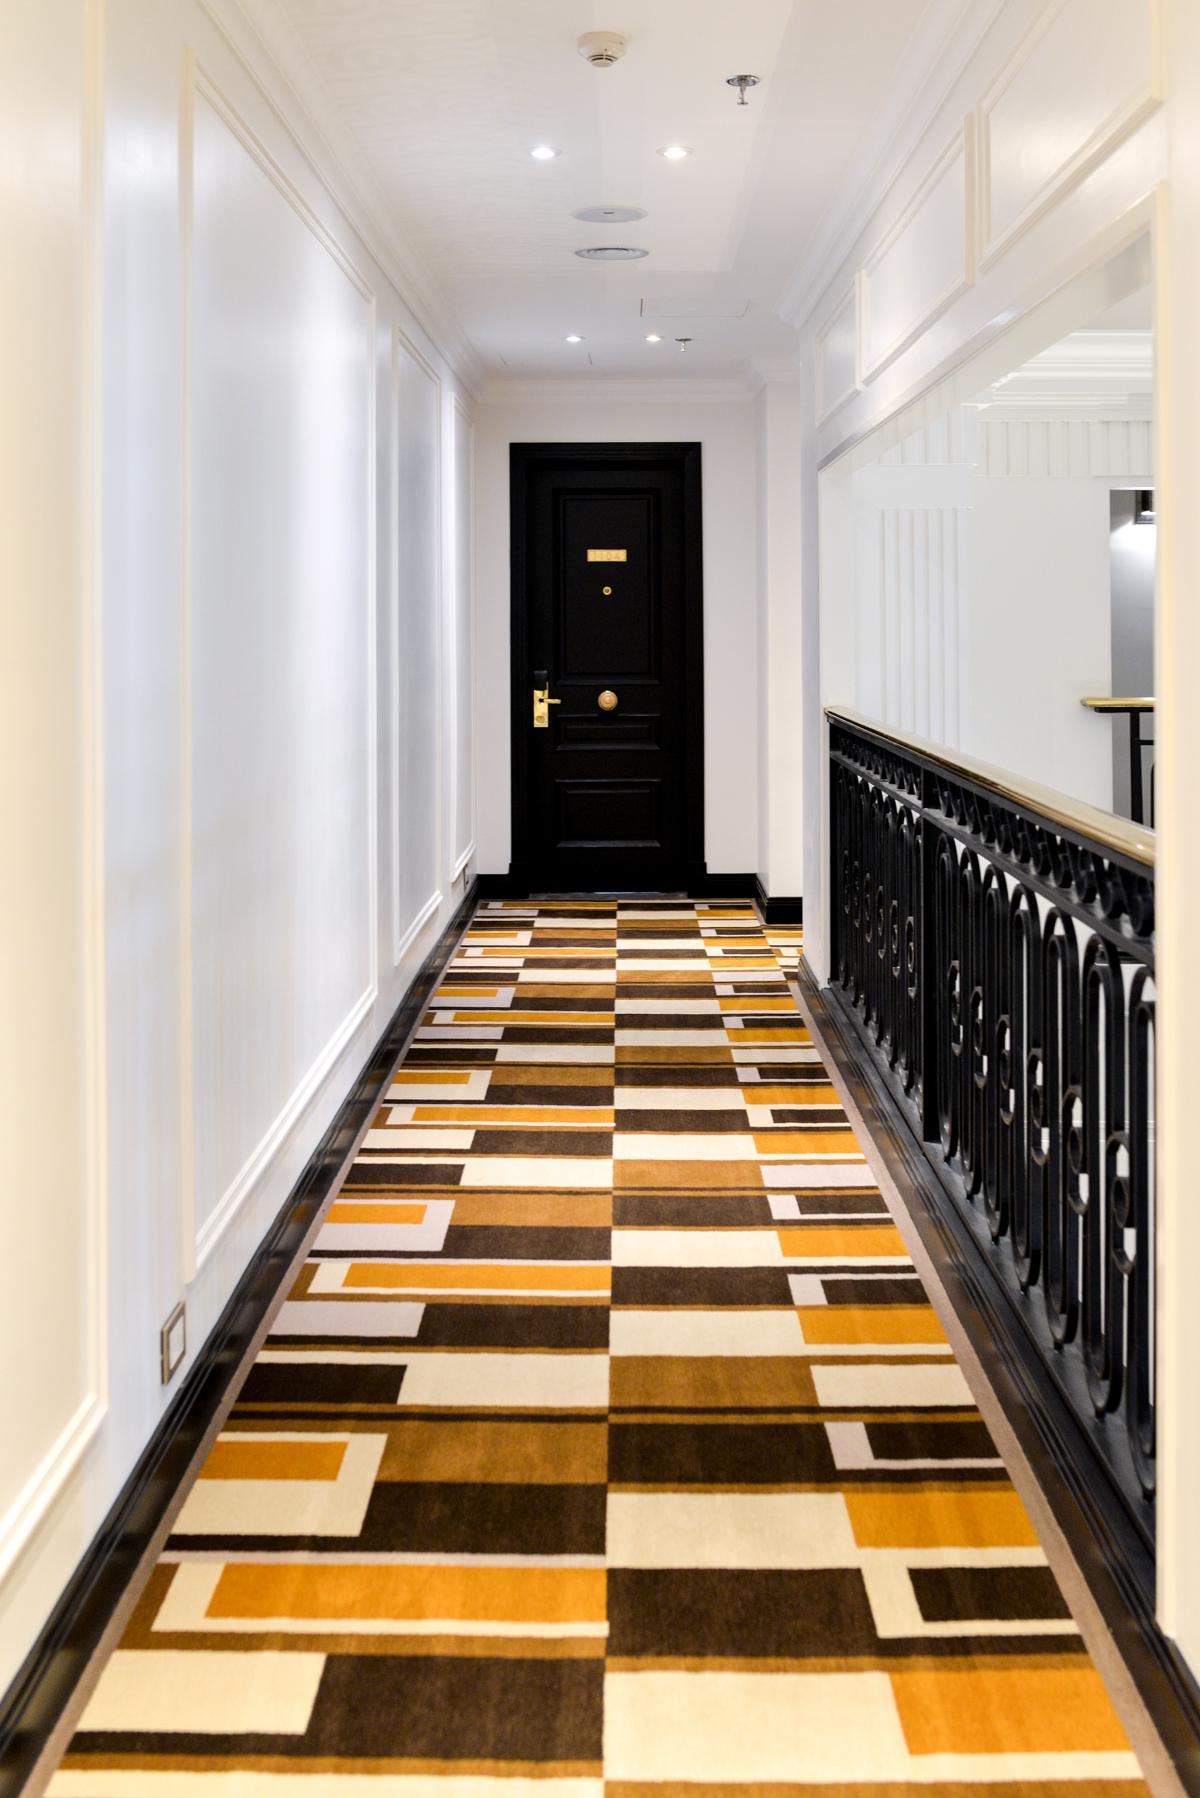 Stacie Flinner x Alvear Palace Hotel Blog-1